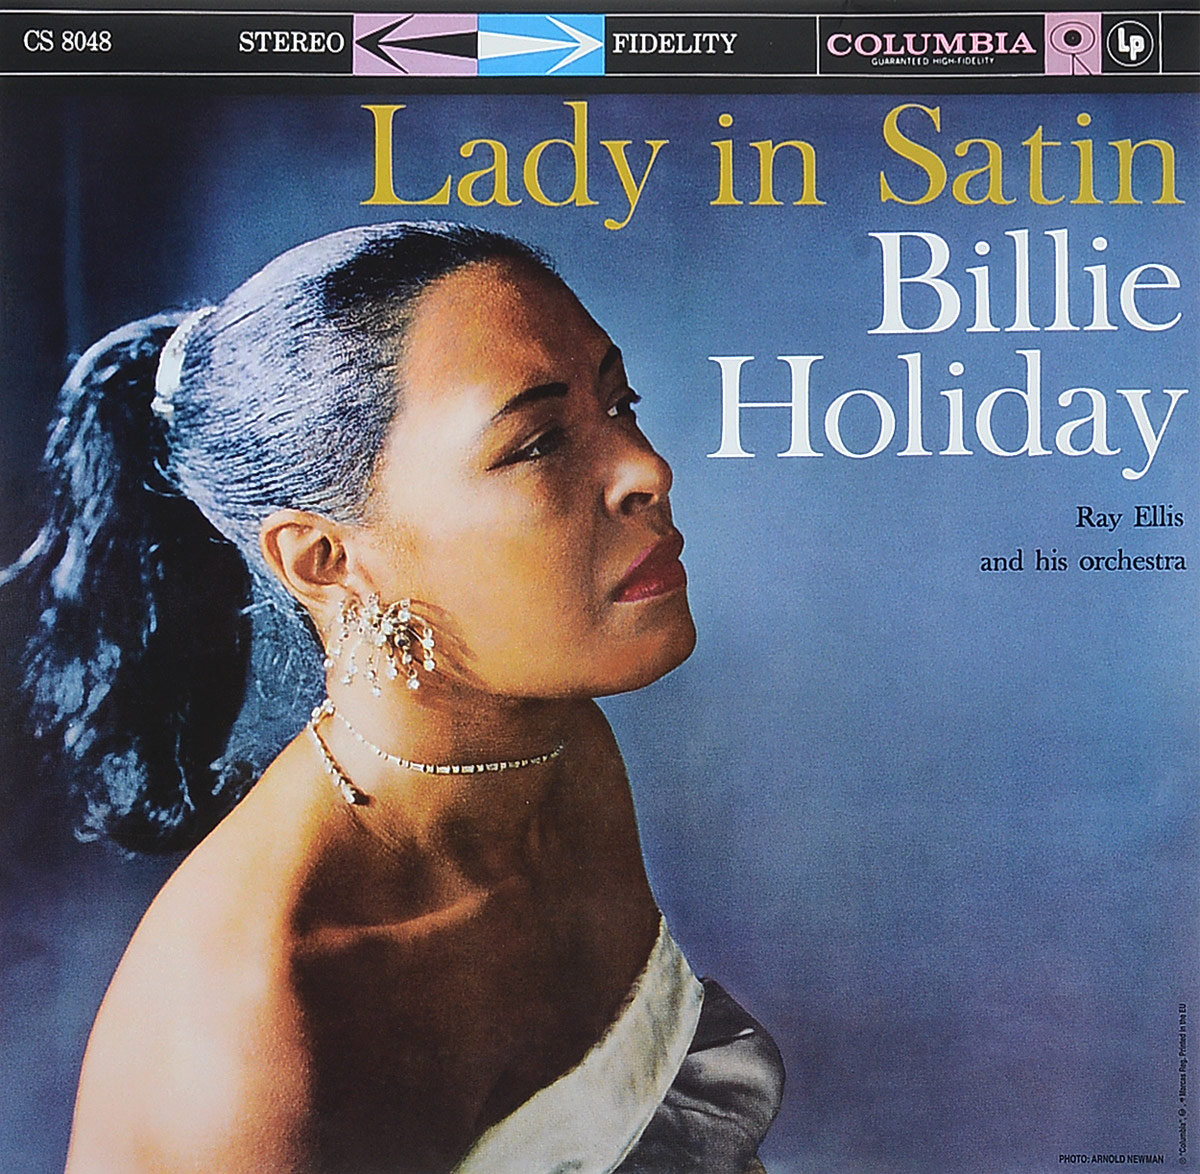 Билли Холидей,Рей Эллис,His Orchestra Billie Holiday, Ray Ellis And His Orchestra. Lady In Satin (LP) цена и фото